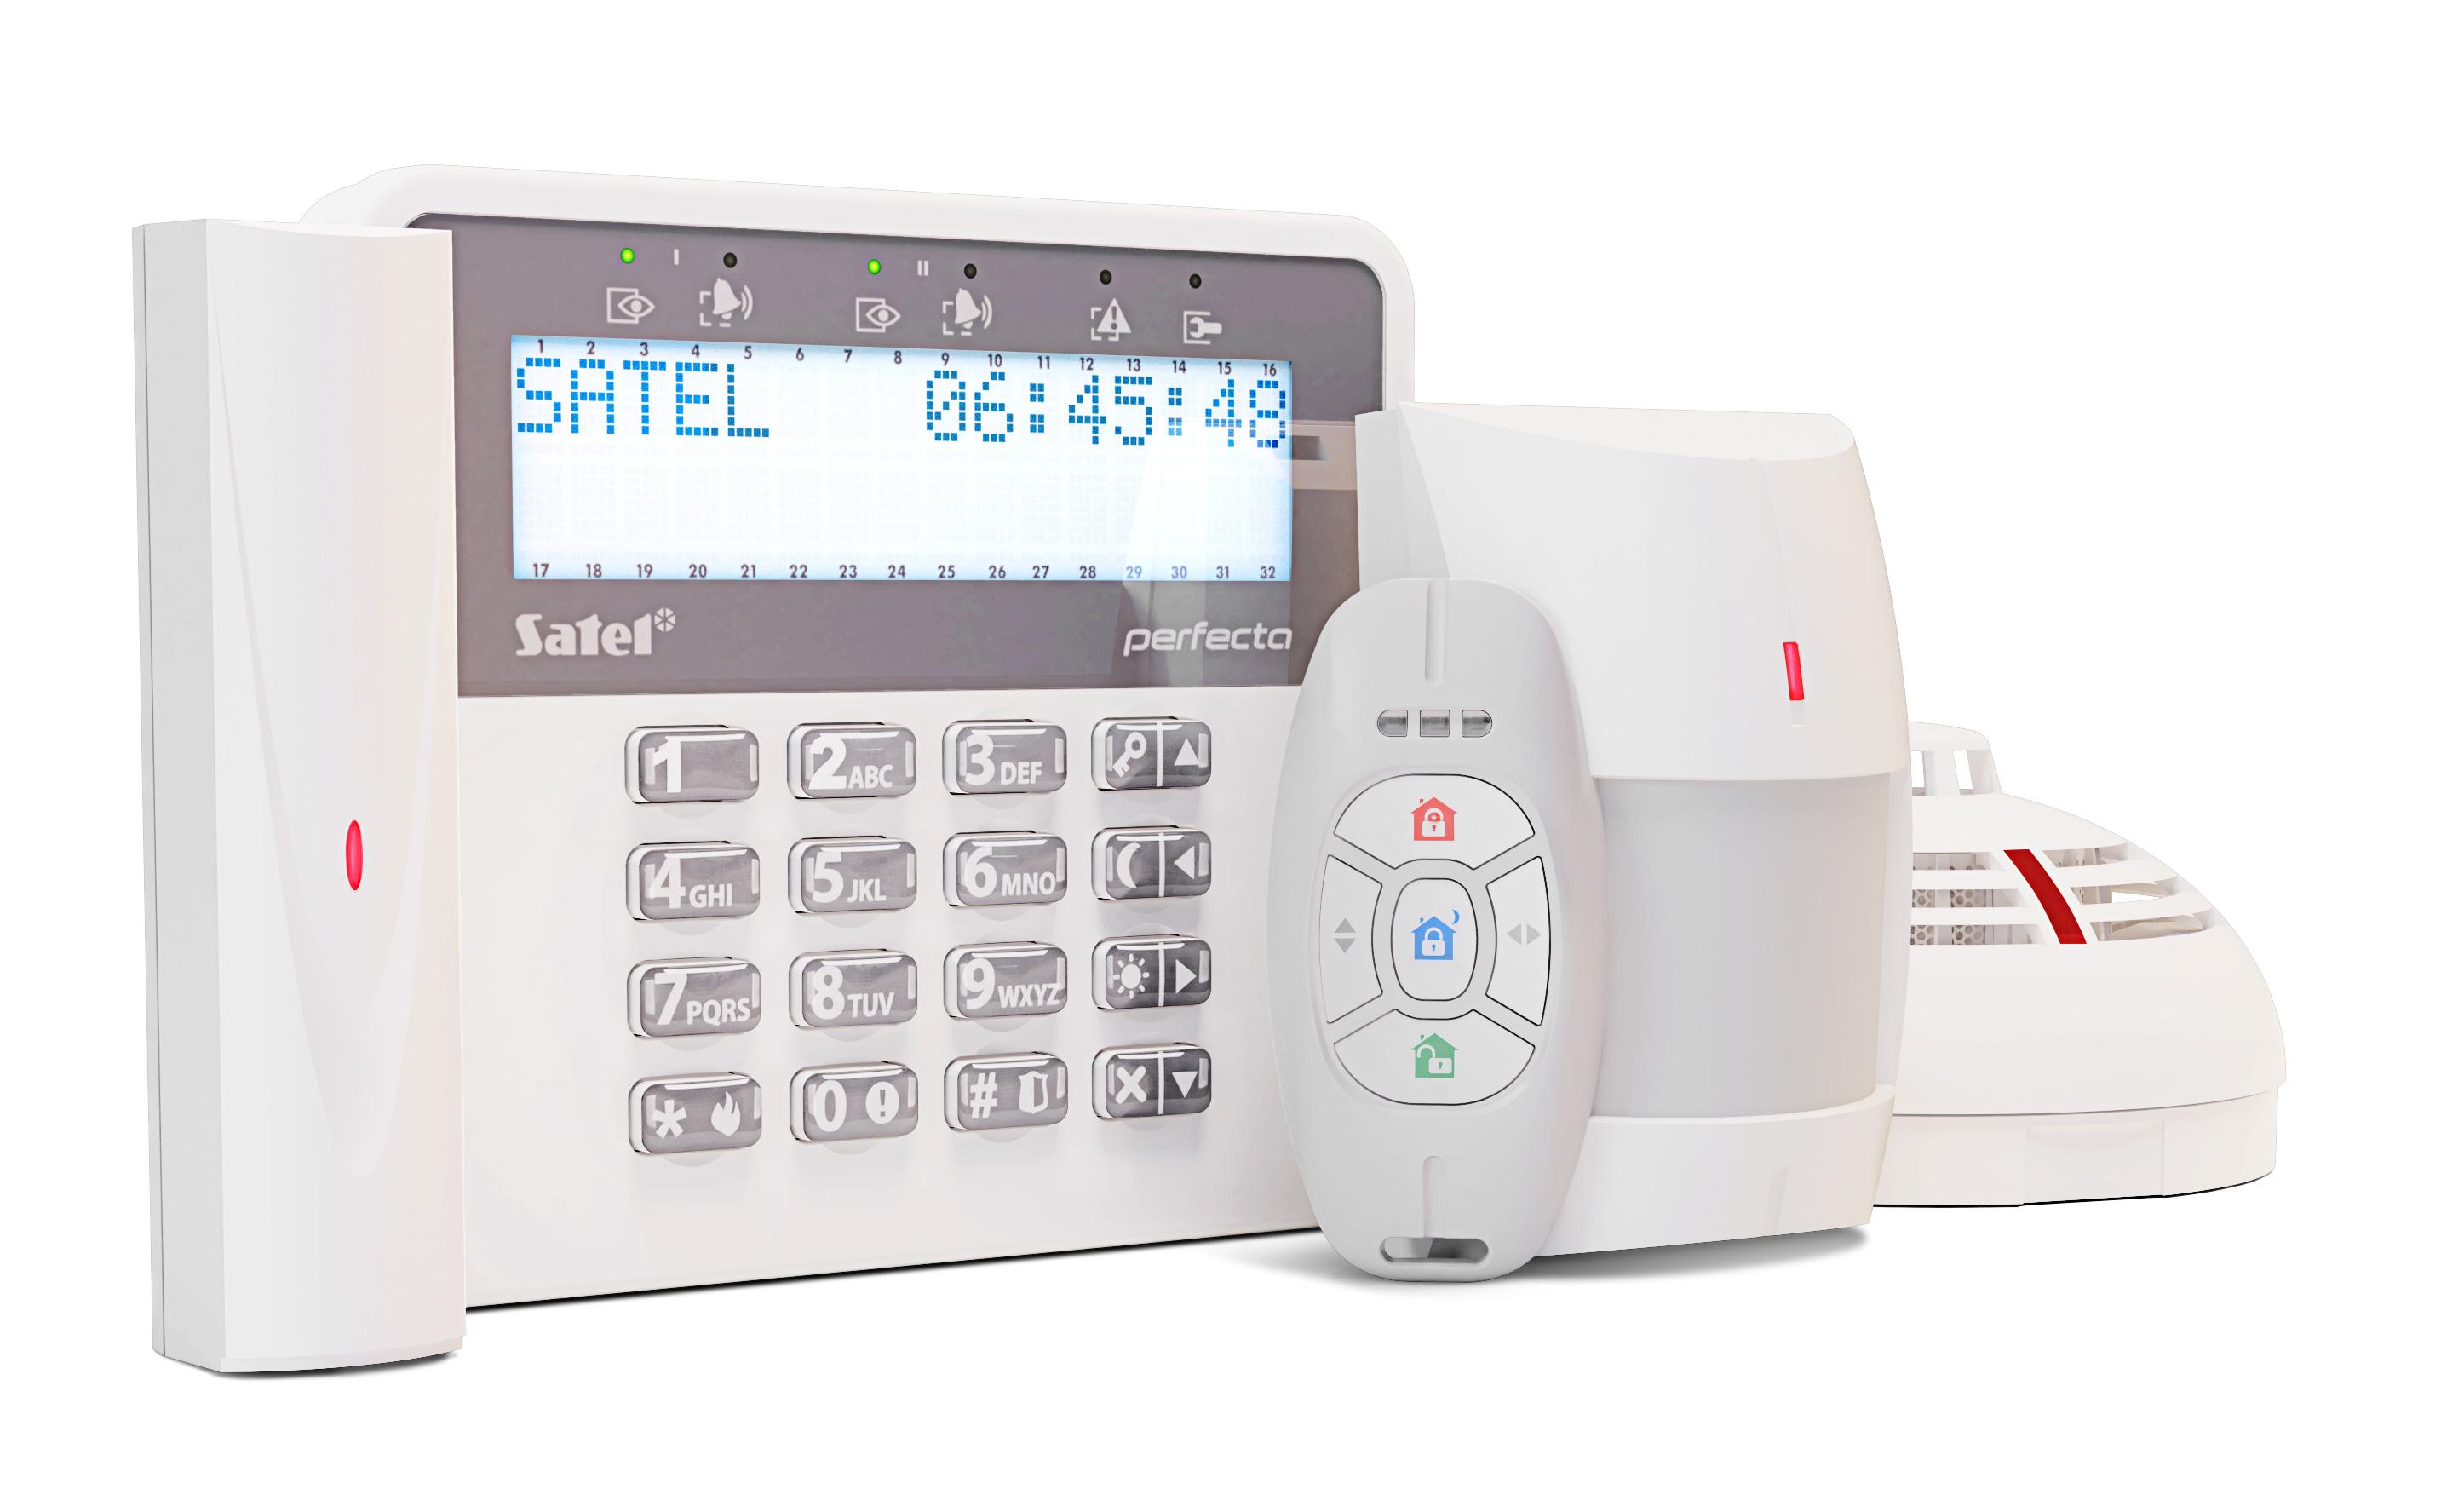 Exhibitor Satel Sp Z O Security Essen Dooropening Alarm Using Hall Sensor Electronics For You System Perfecta